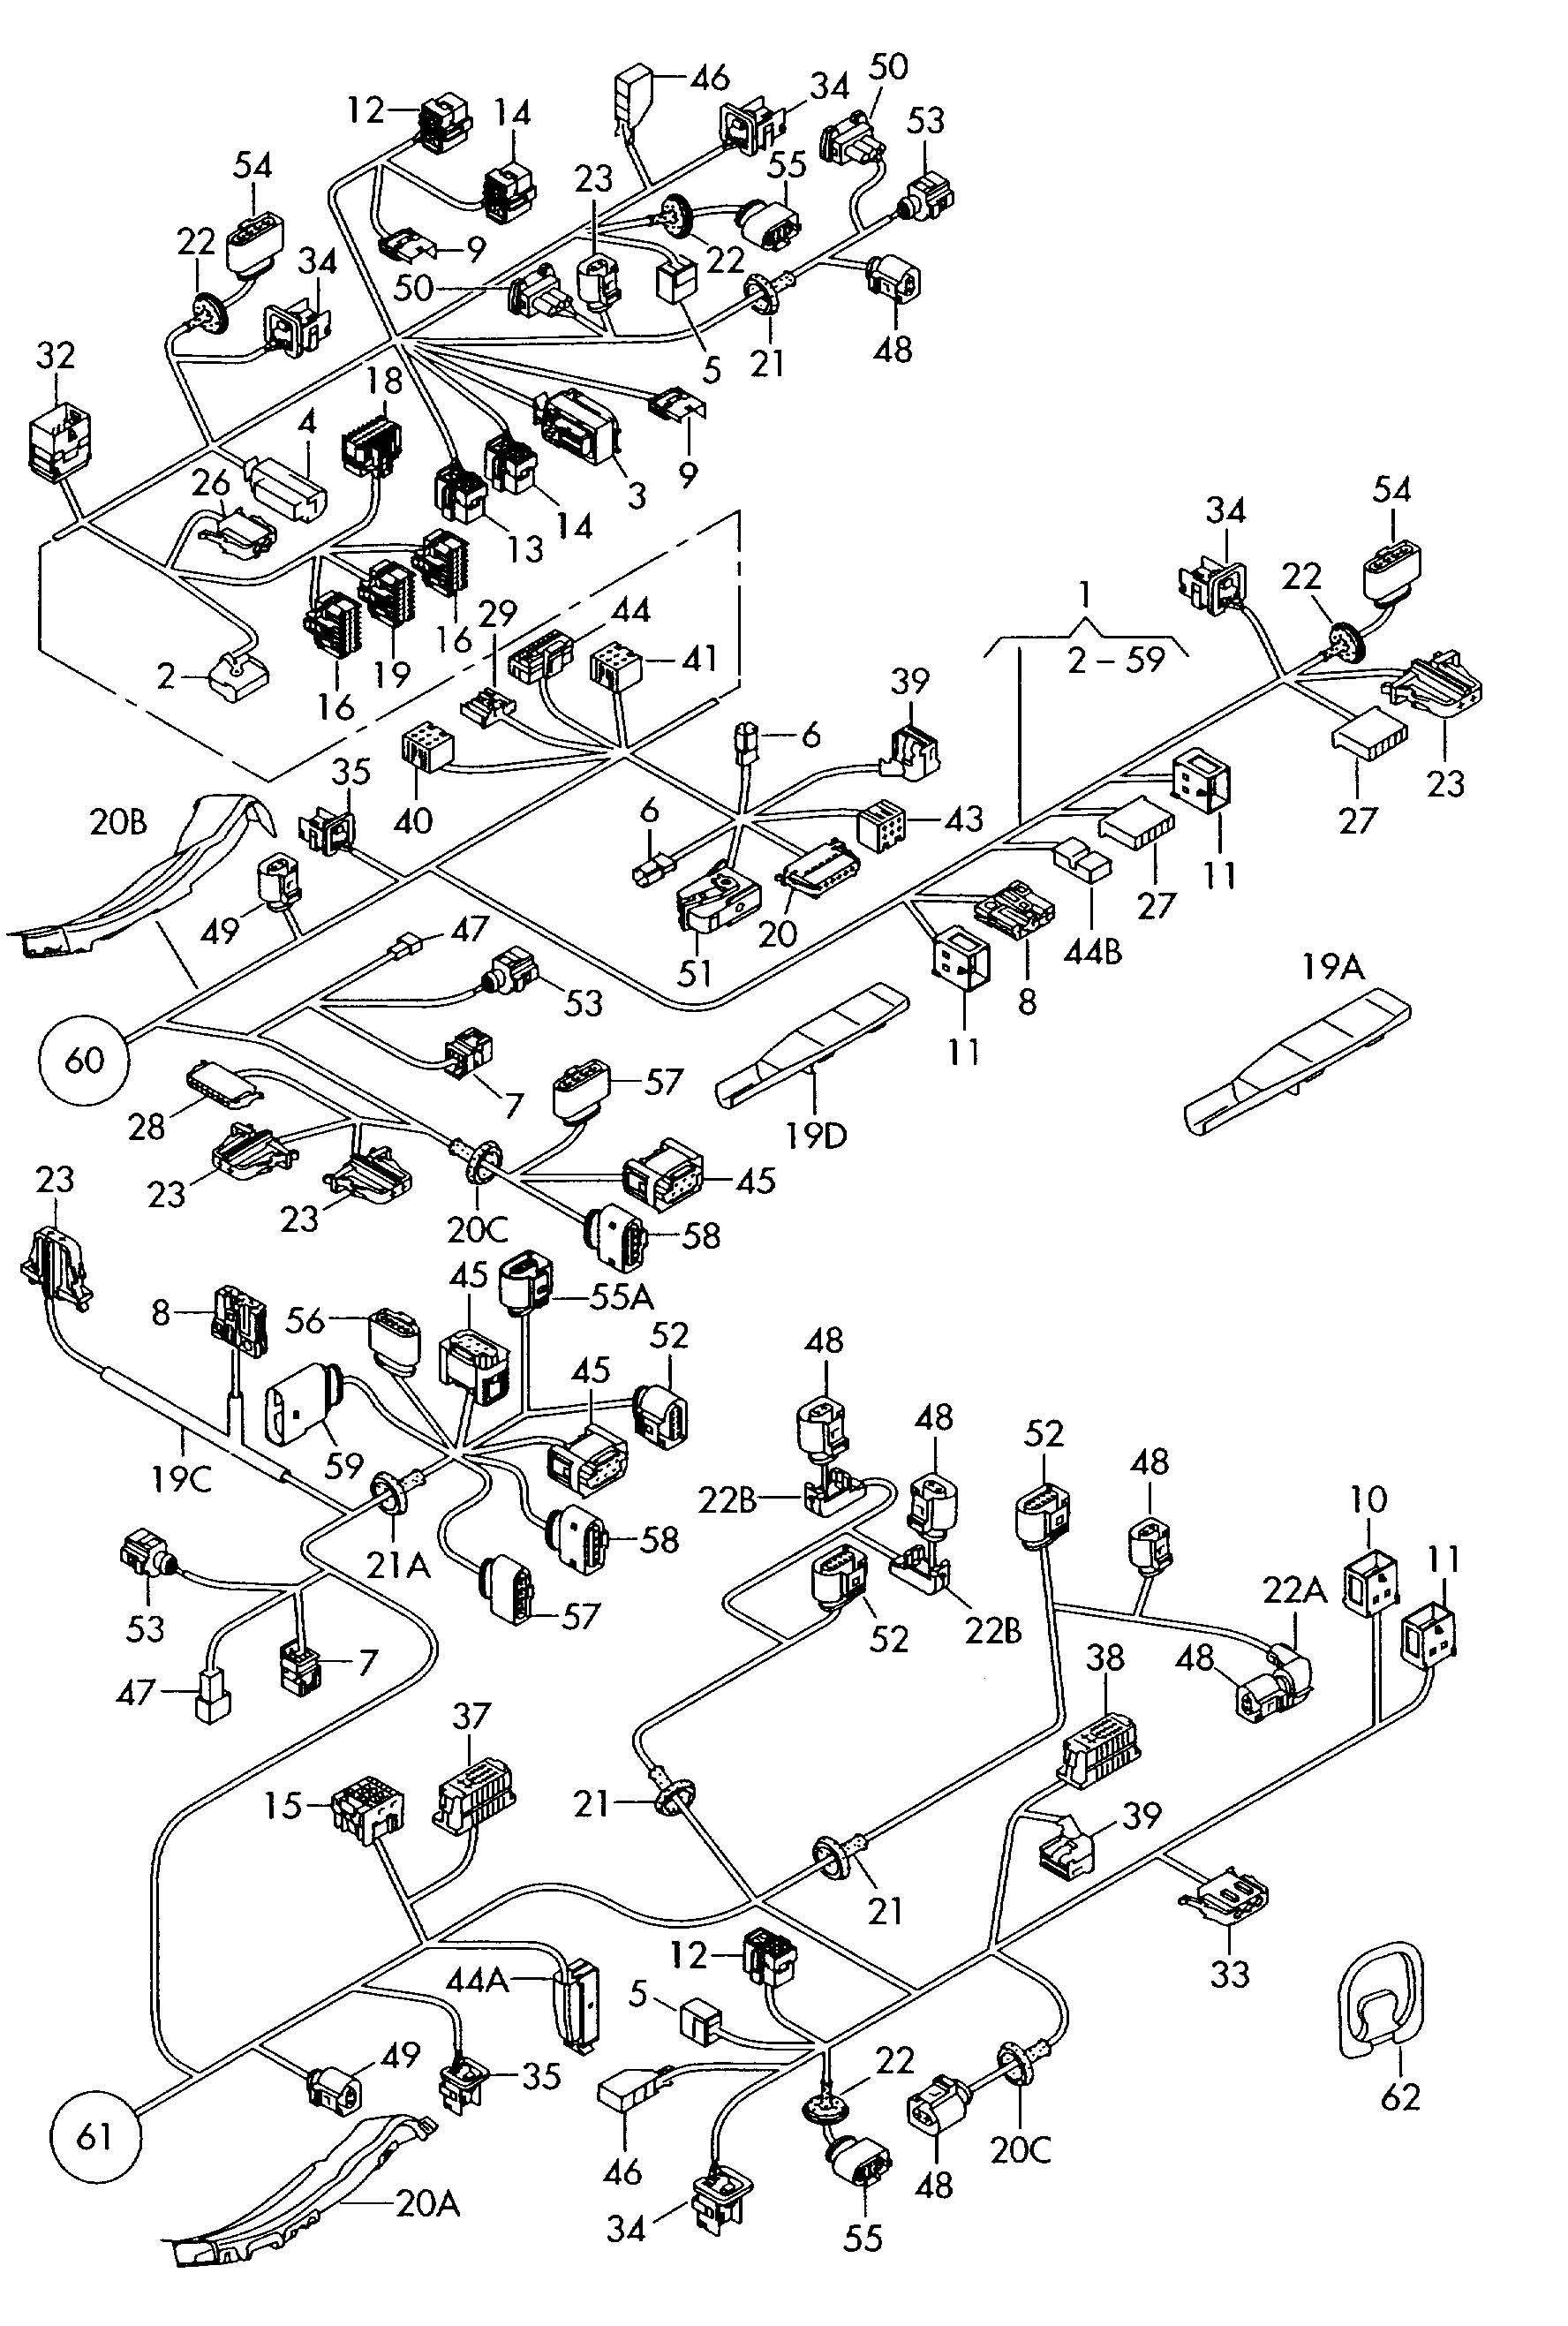 volkswagen touareg power module flat contact housing with contact locking mechanism